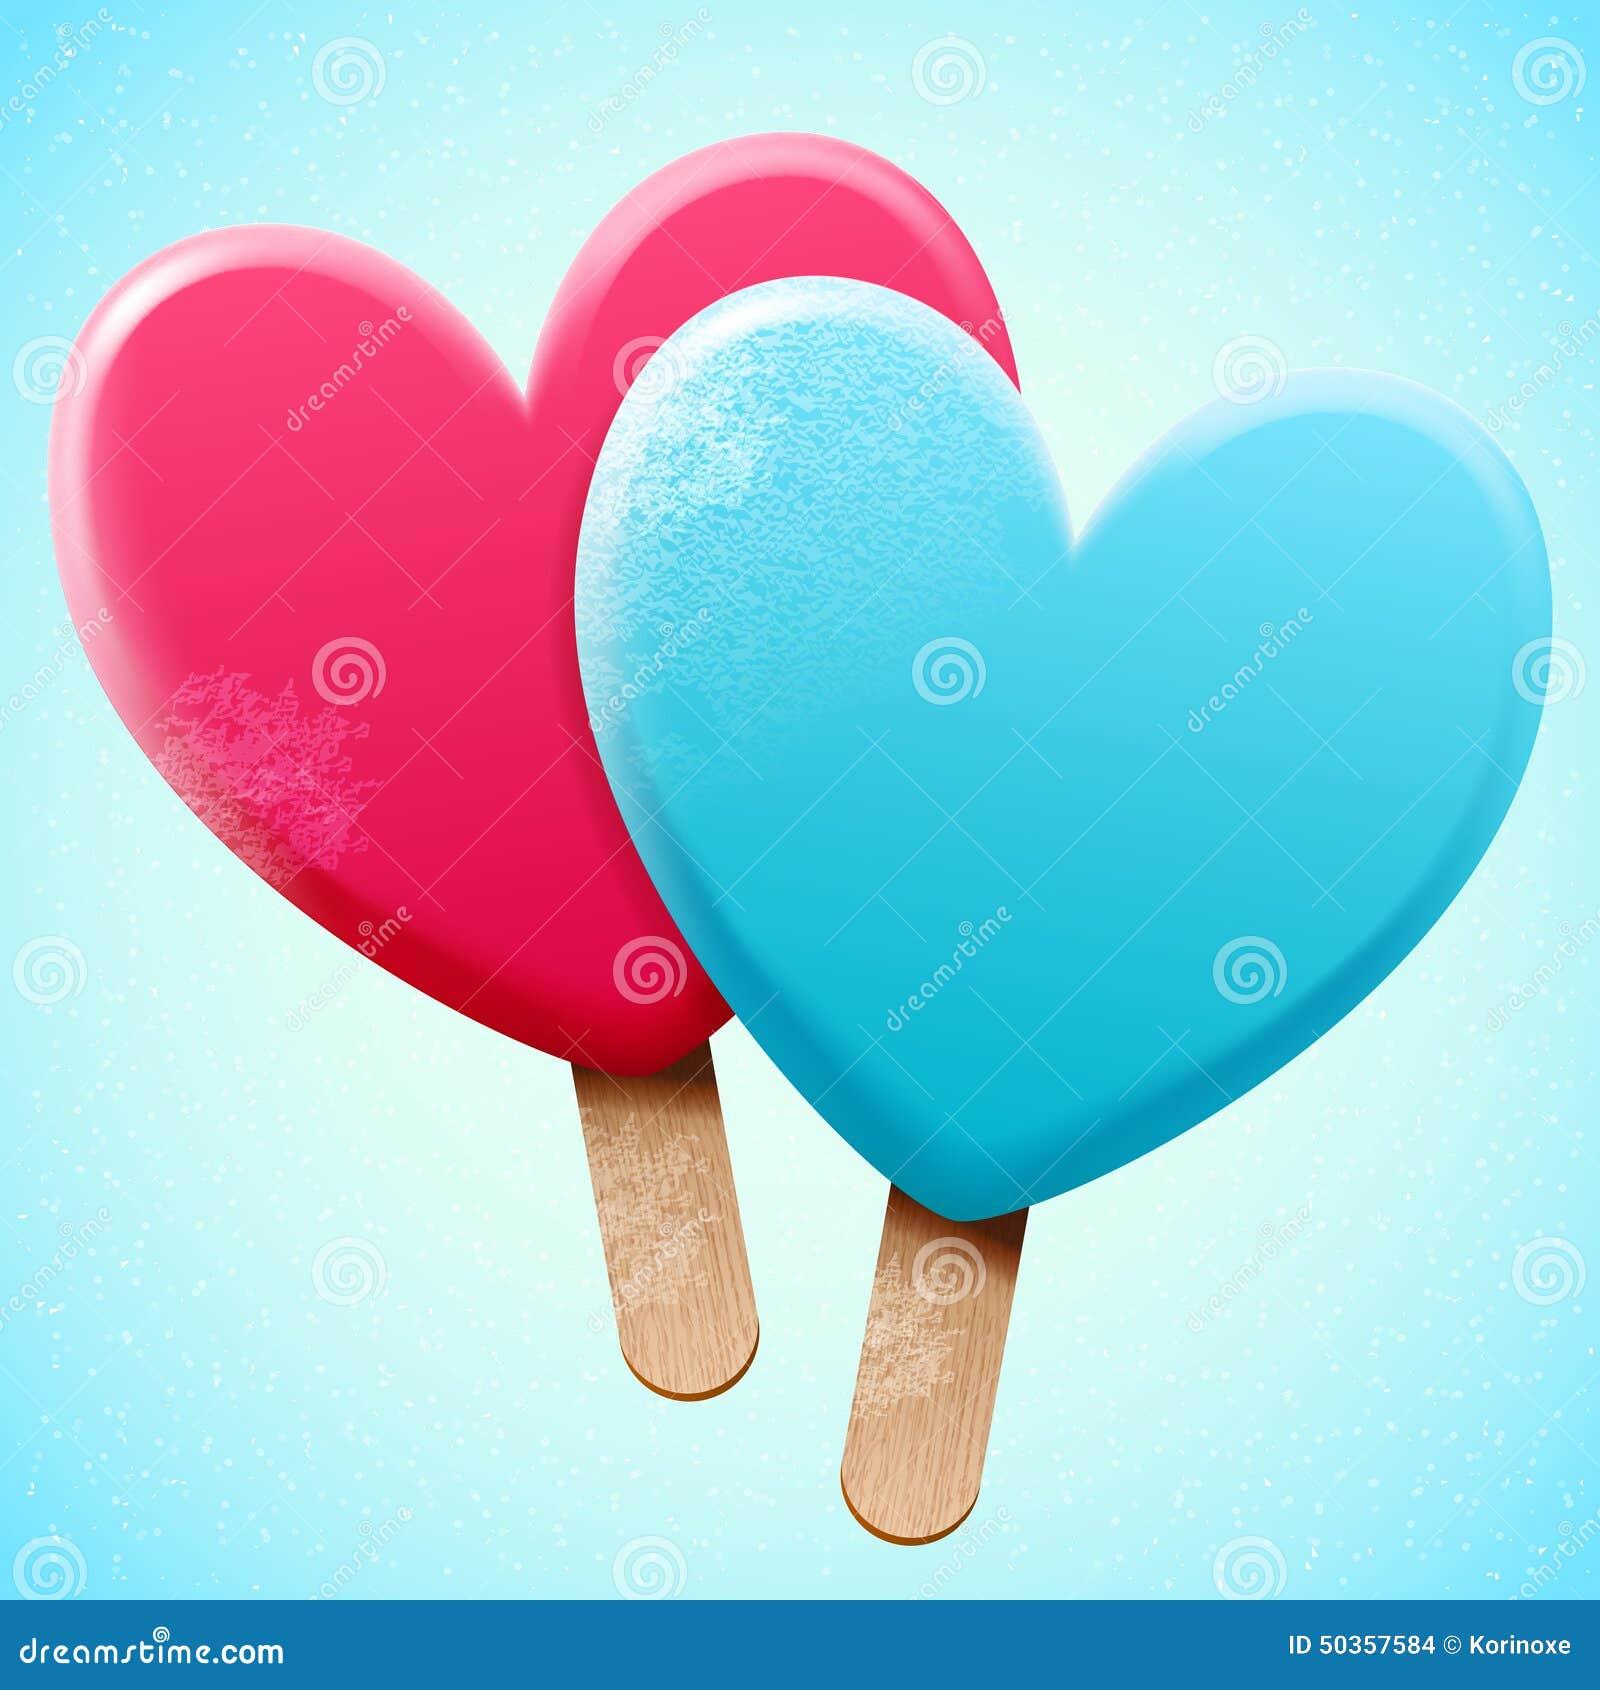 Fresh Ice Cream Stick In Summer Wallpaper Vector: Bright Ice Cream On A Stick Stock Vector